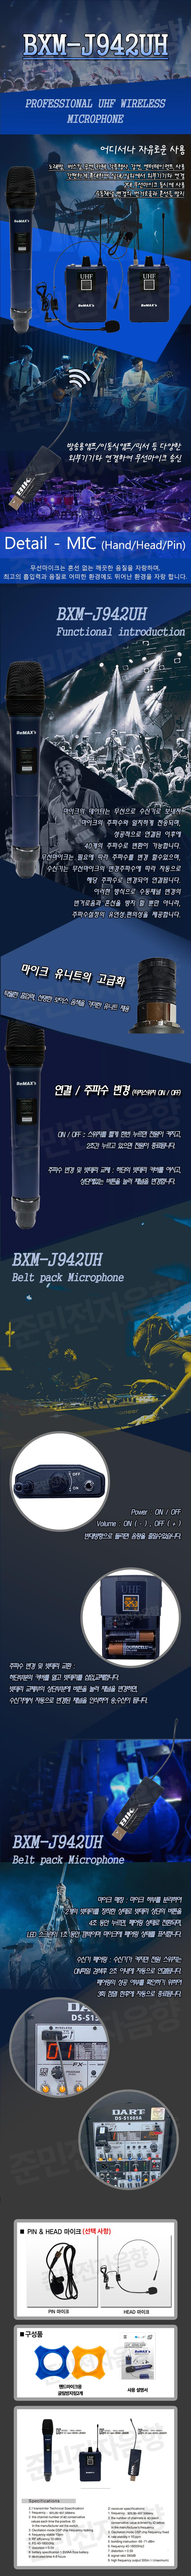 BXM-J942UH-JM-0719-2.jpg